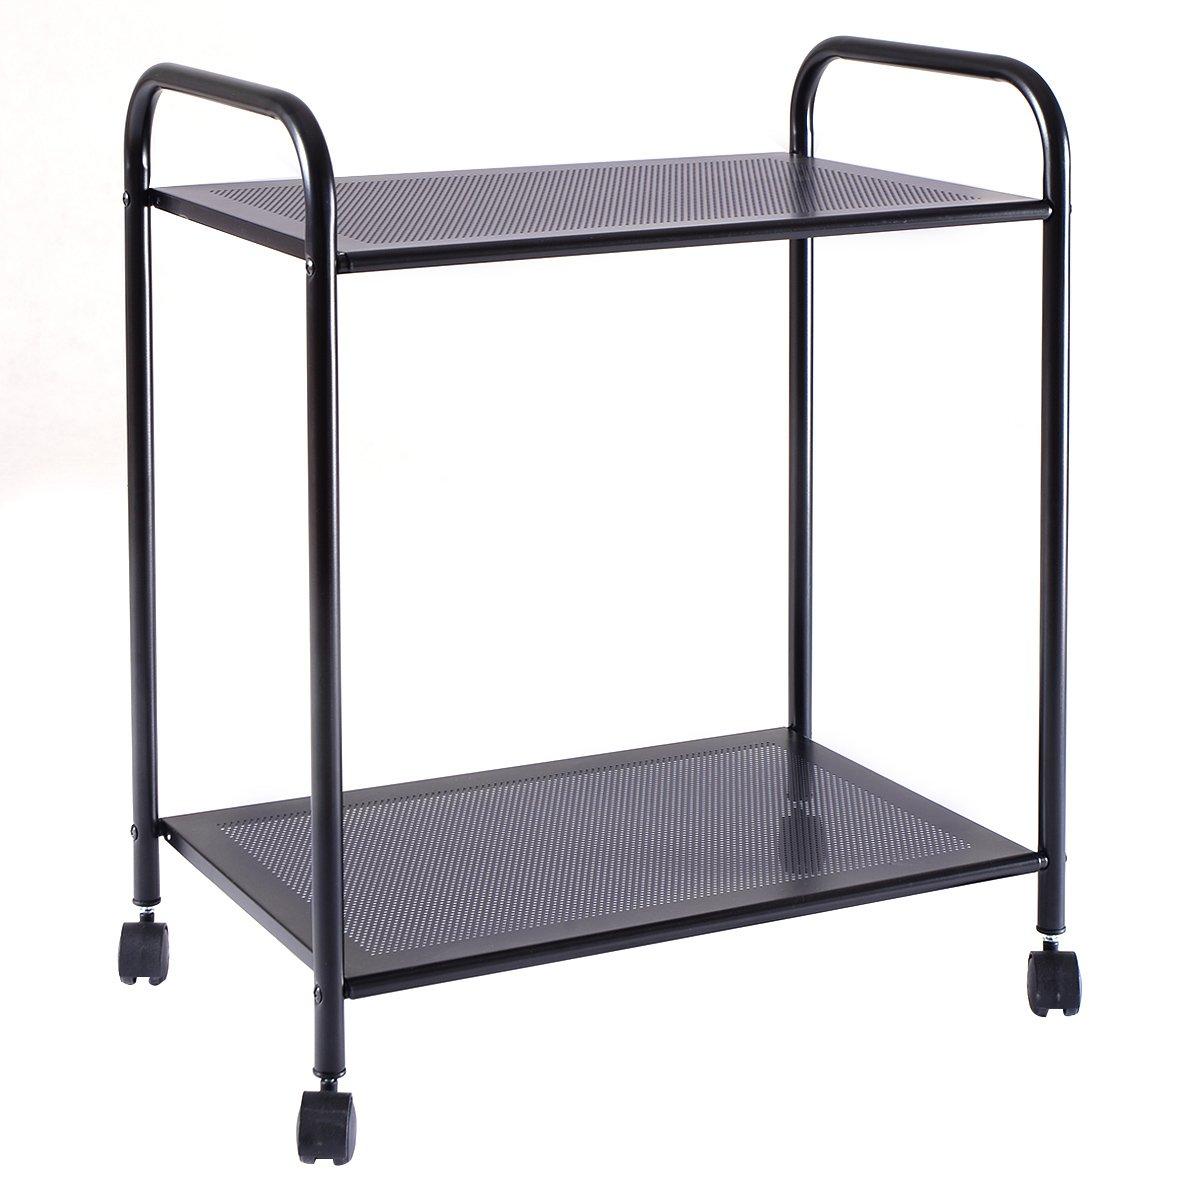 Giantex 2 Tiers Storage Display Rack Mesh Shelf Home Kitchen Bathroom Organizer W/Wheels (2 Tiers)